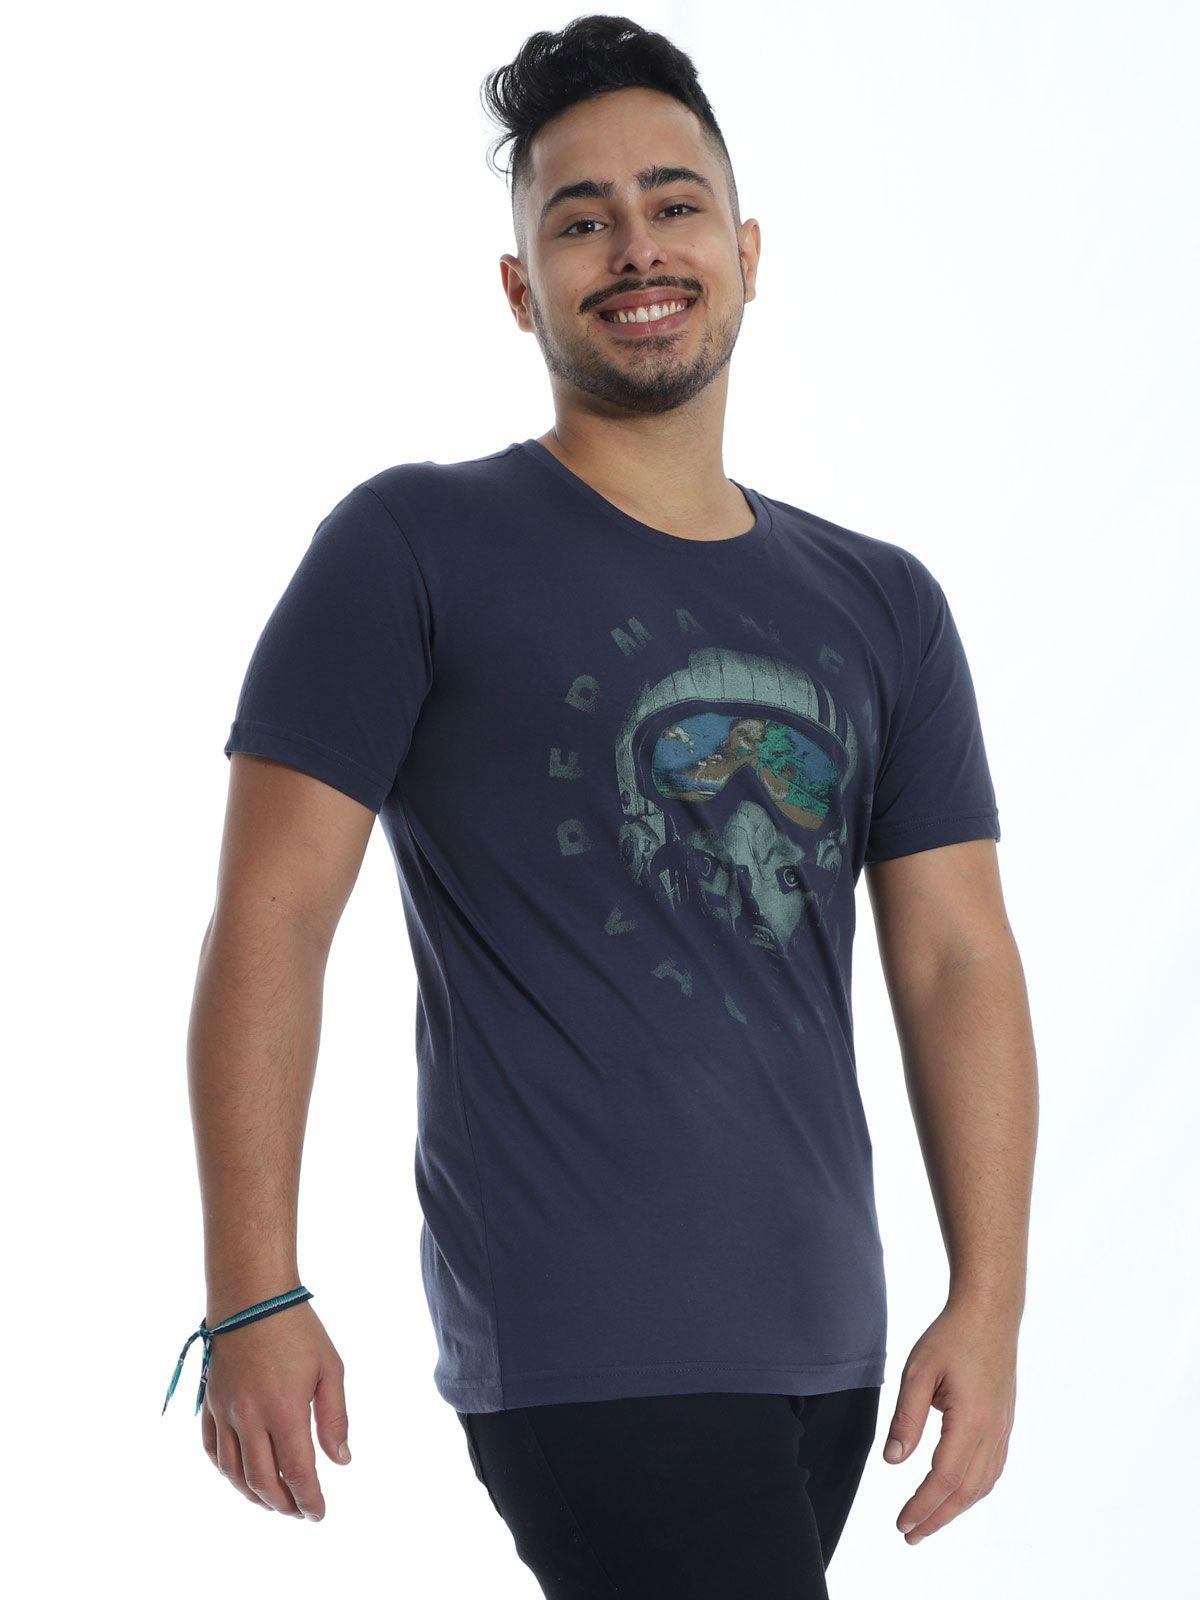 Camiseta Masculina Slim Fit Anistia Vacation Grafite